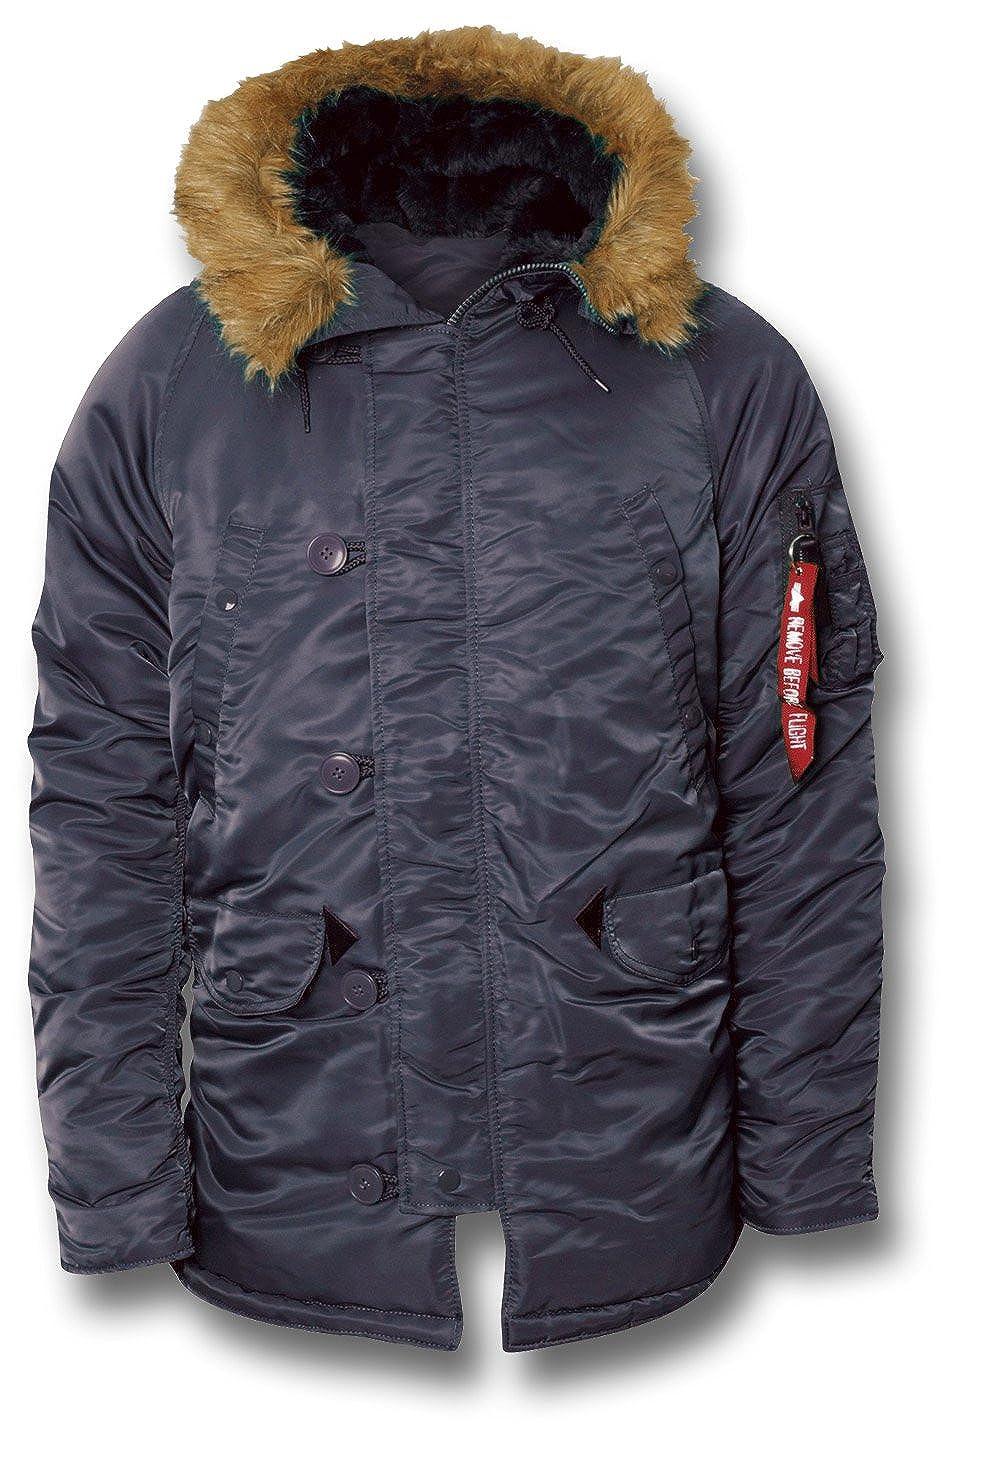 Alpha Industries Extreme Cold Weather N3B Parka Men's Jacket